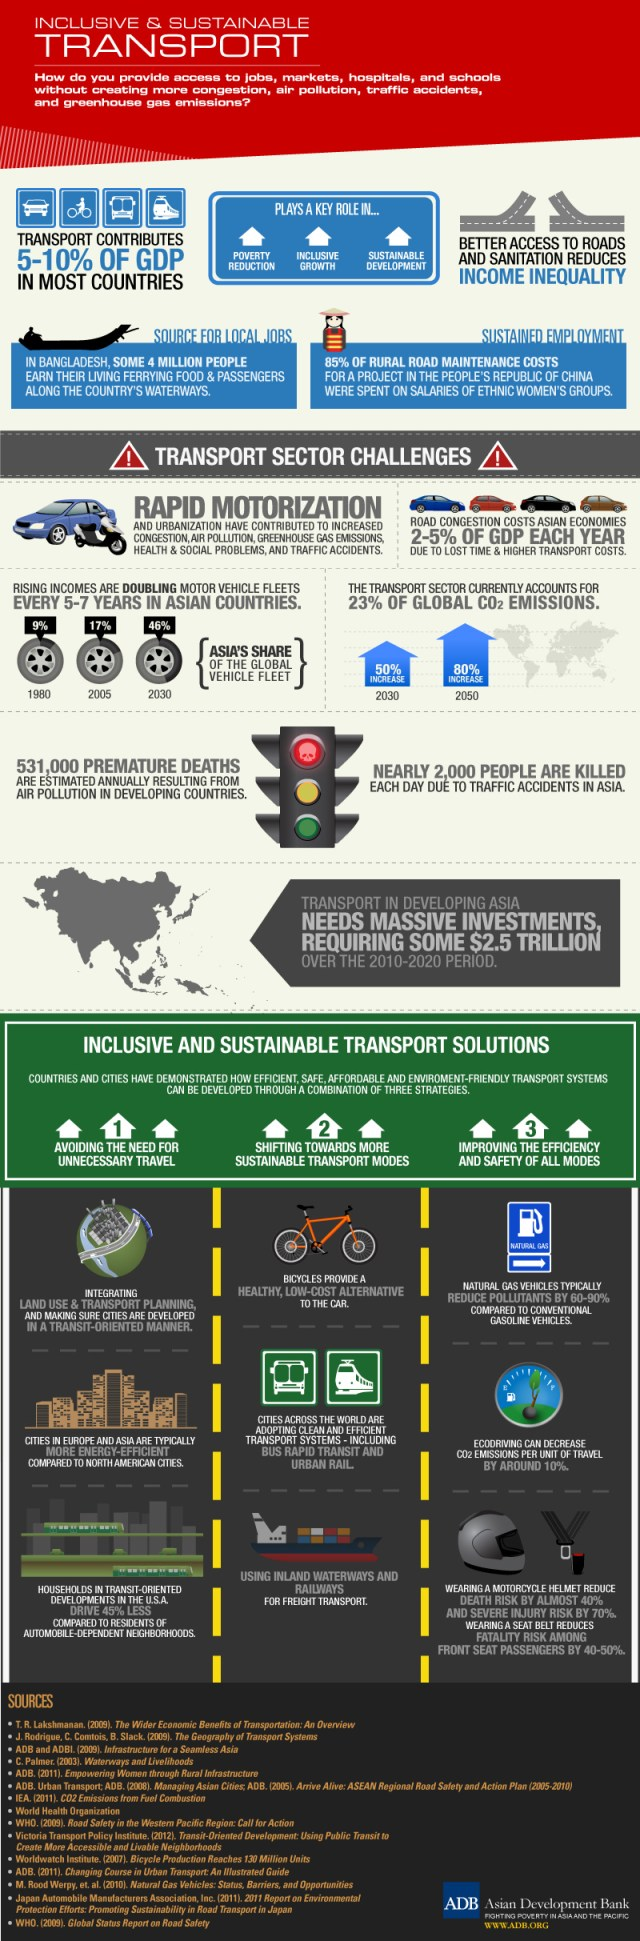 Sustainable Transport ADB graphic